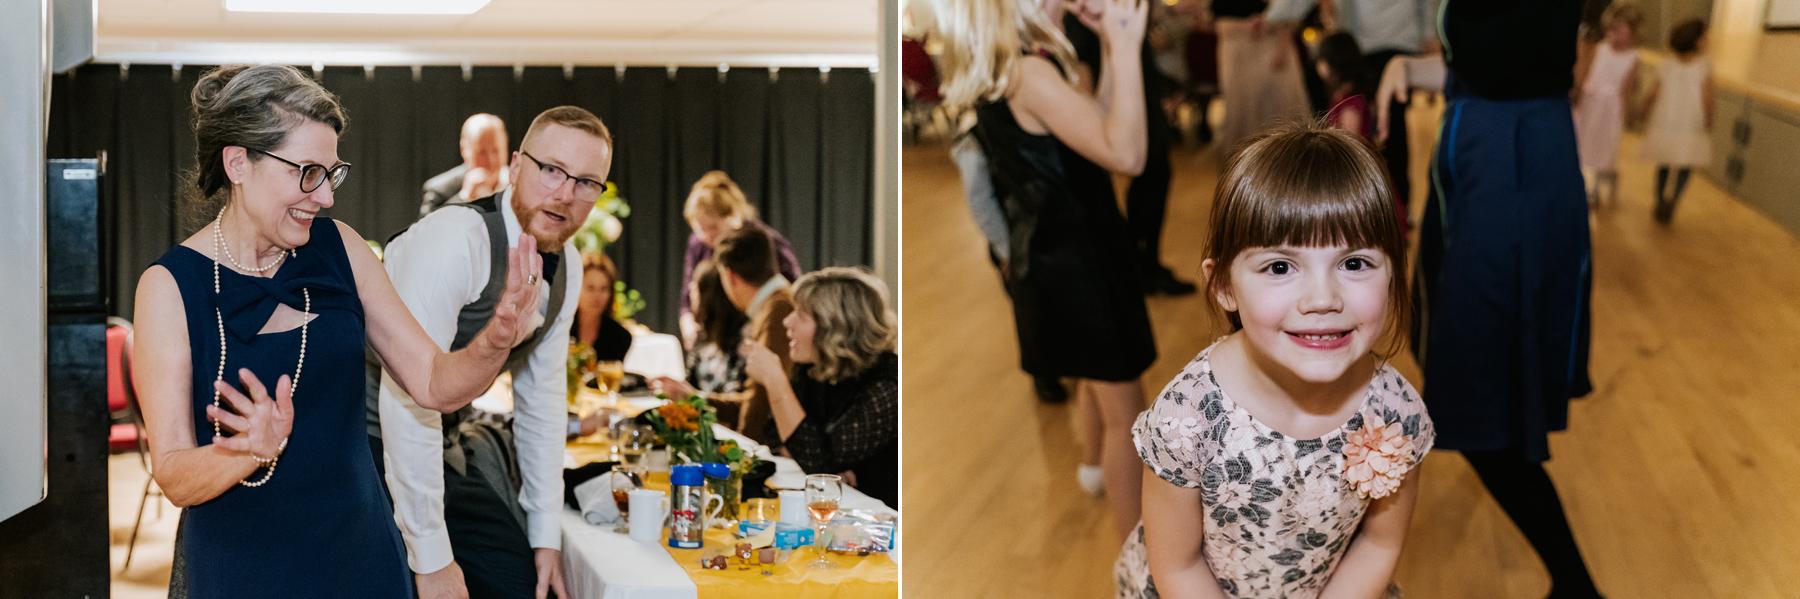 lethbridge-wedding-photography-pd2019-77